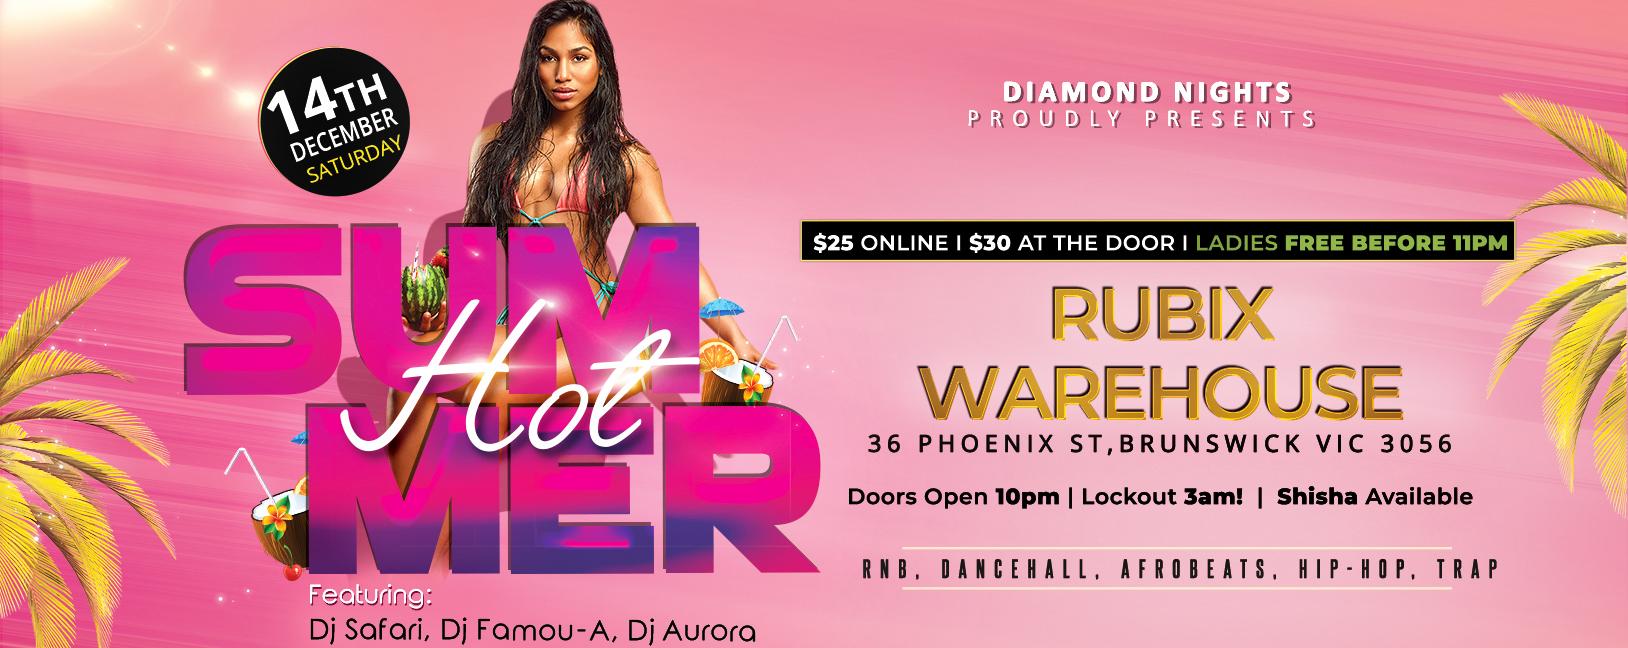 diamond-nights-flyer-cover